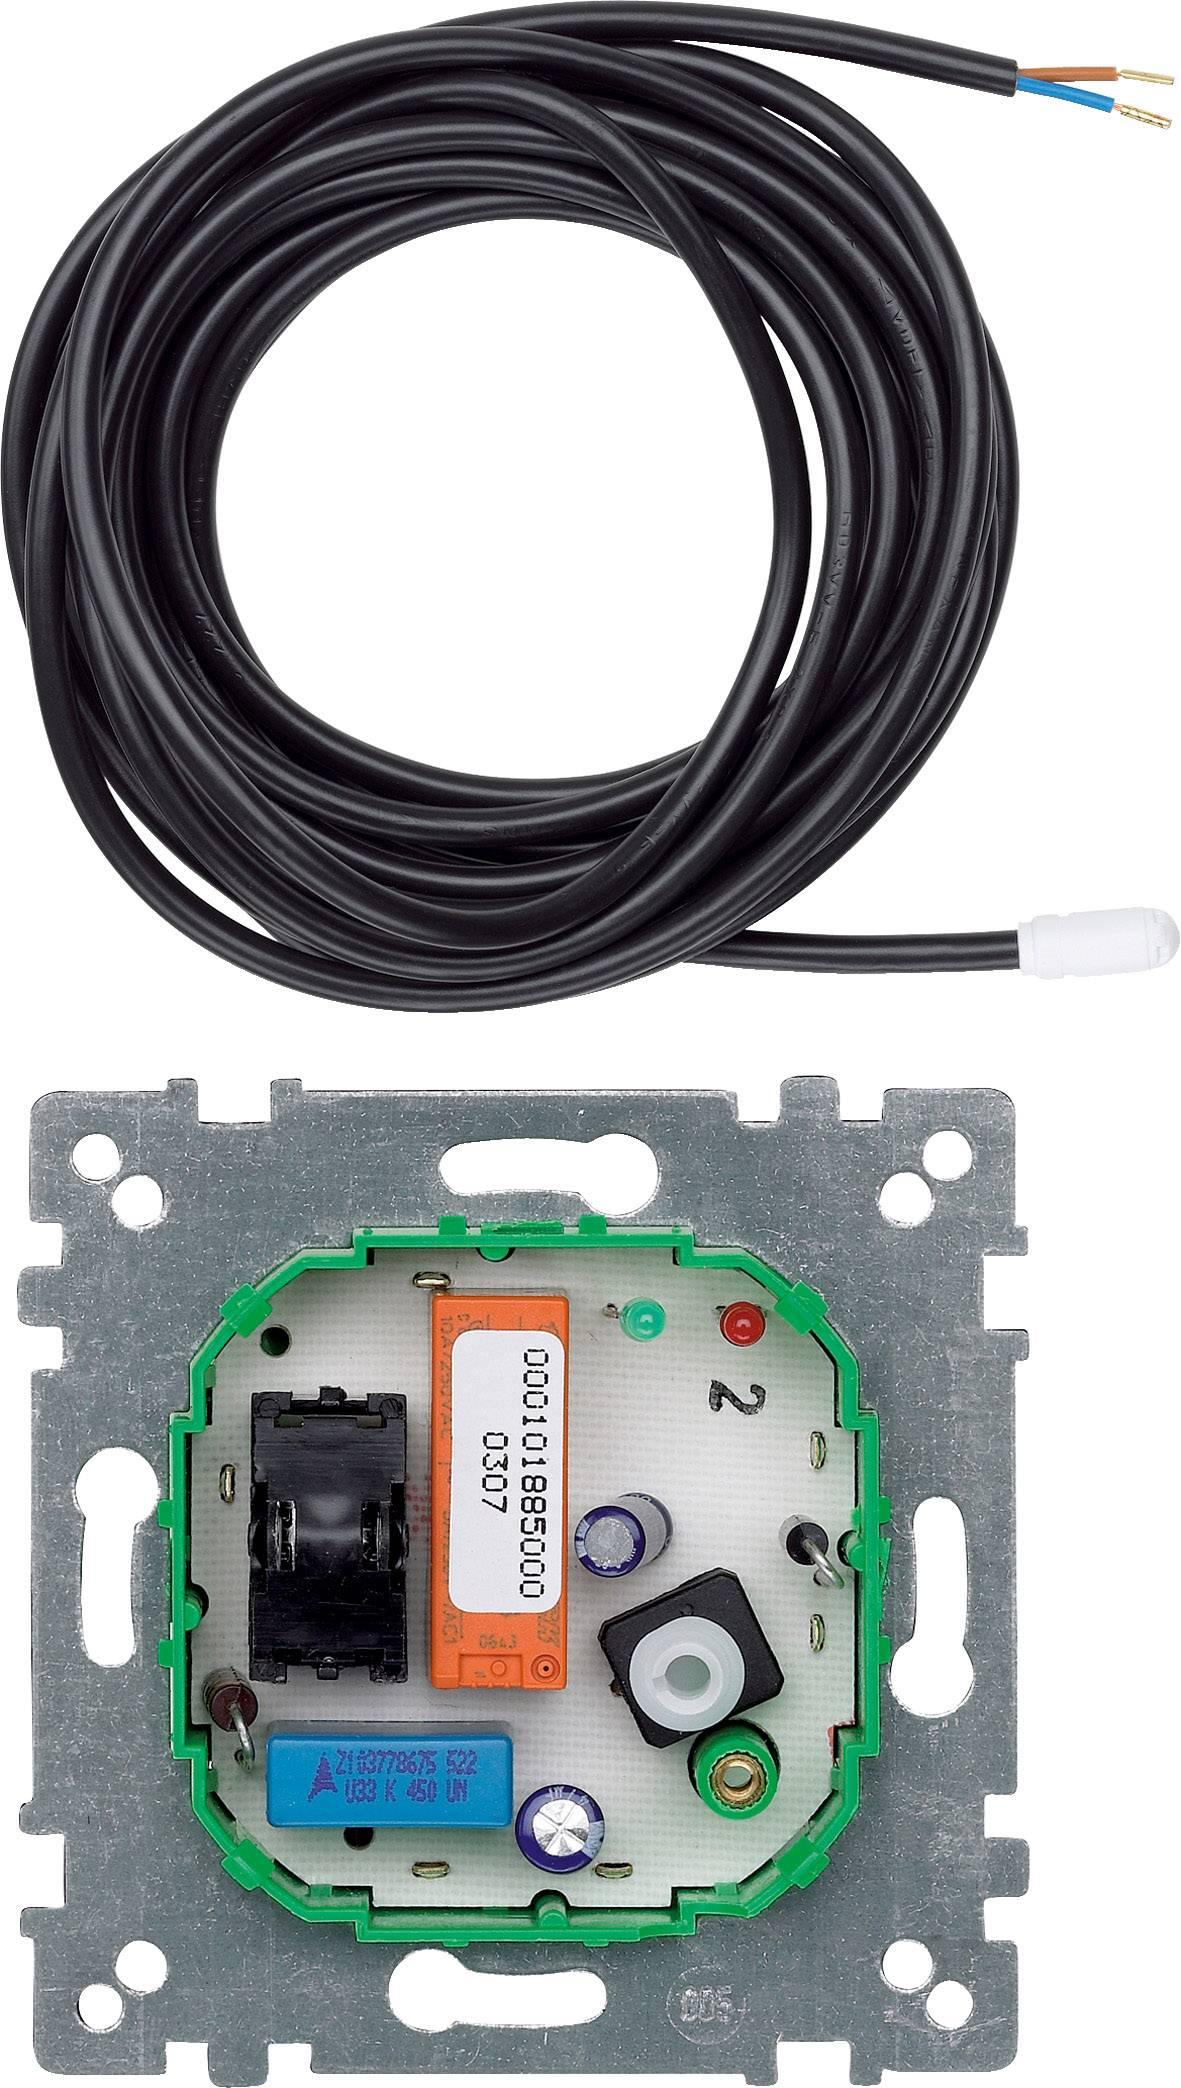 Pokojový termostat Merten 537100, 10 až 50 °C